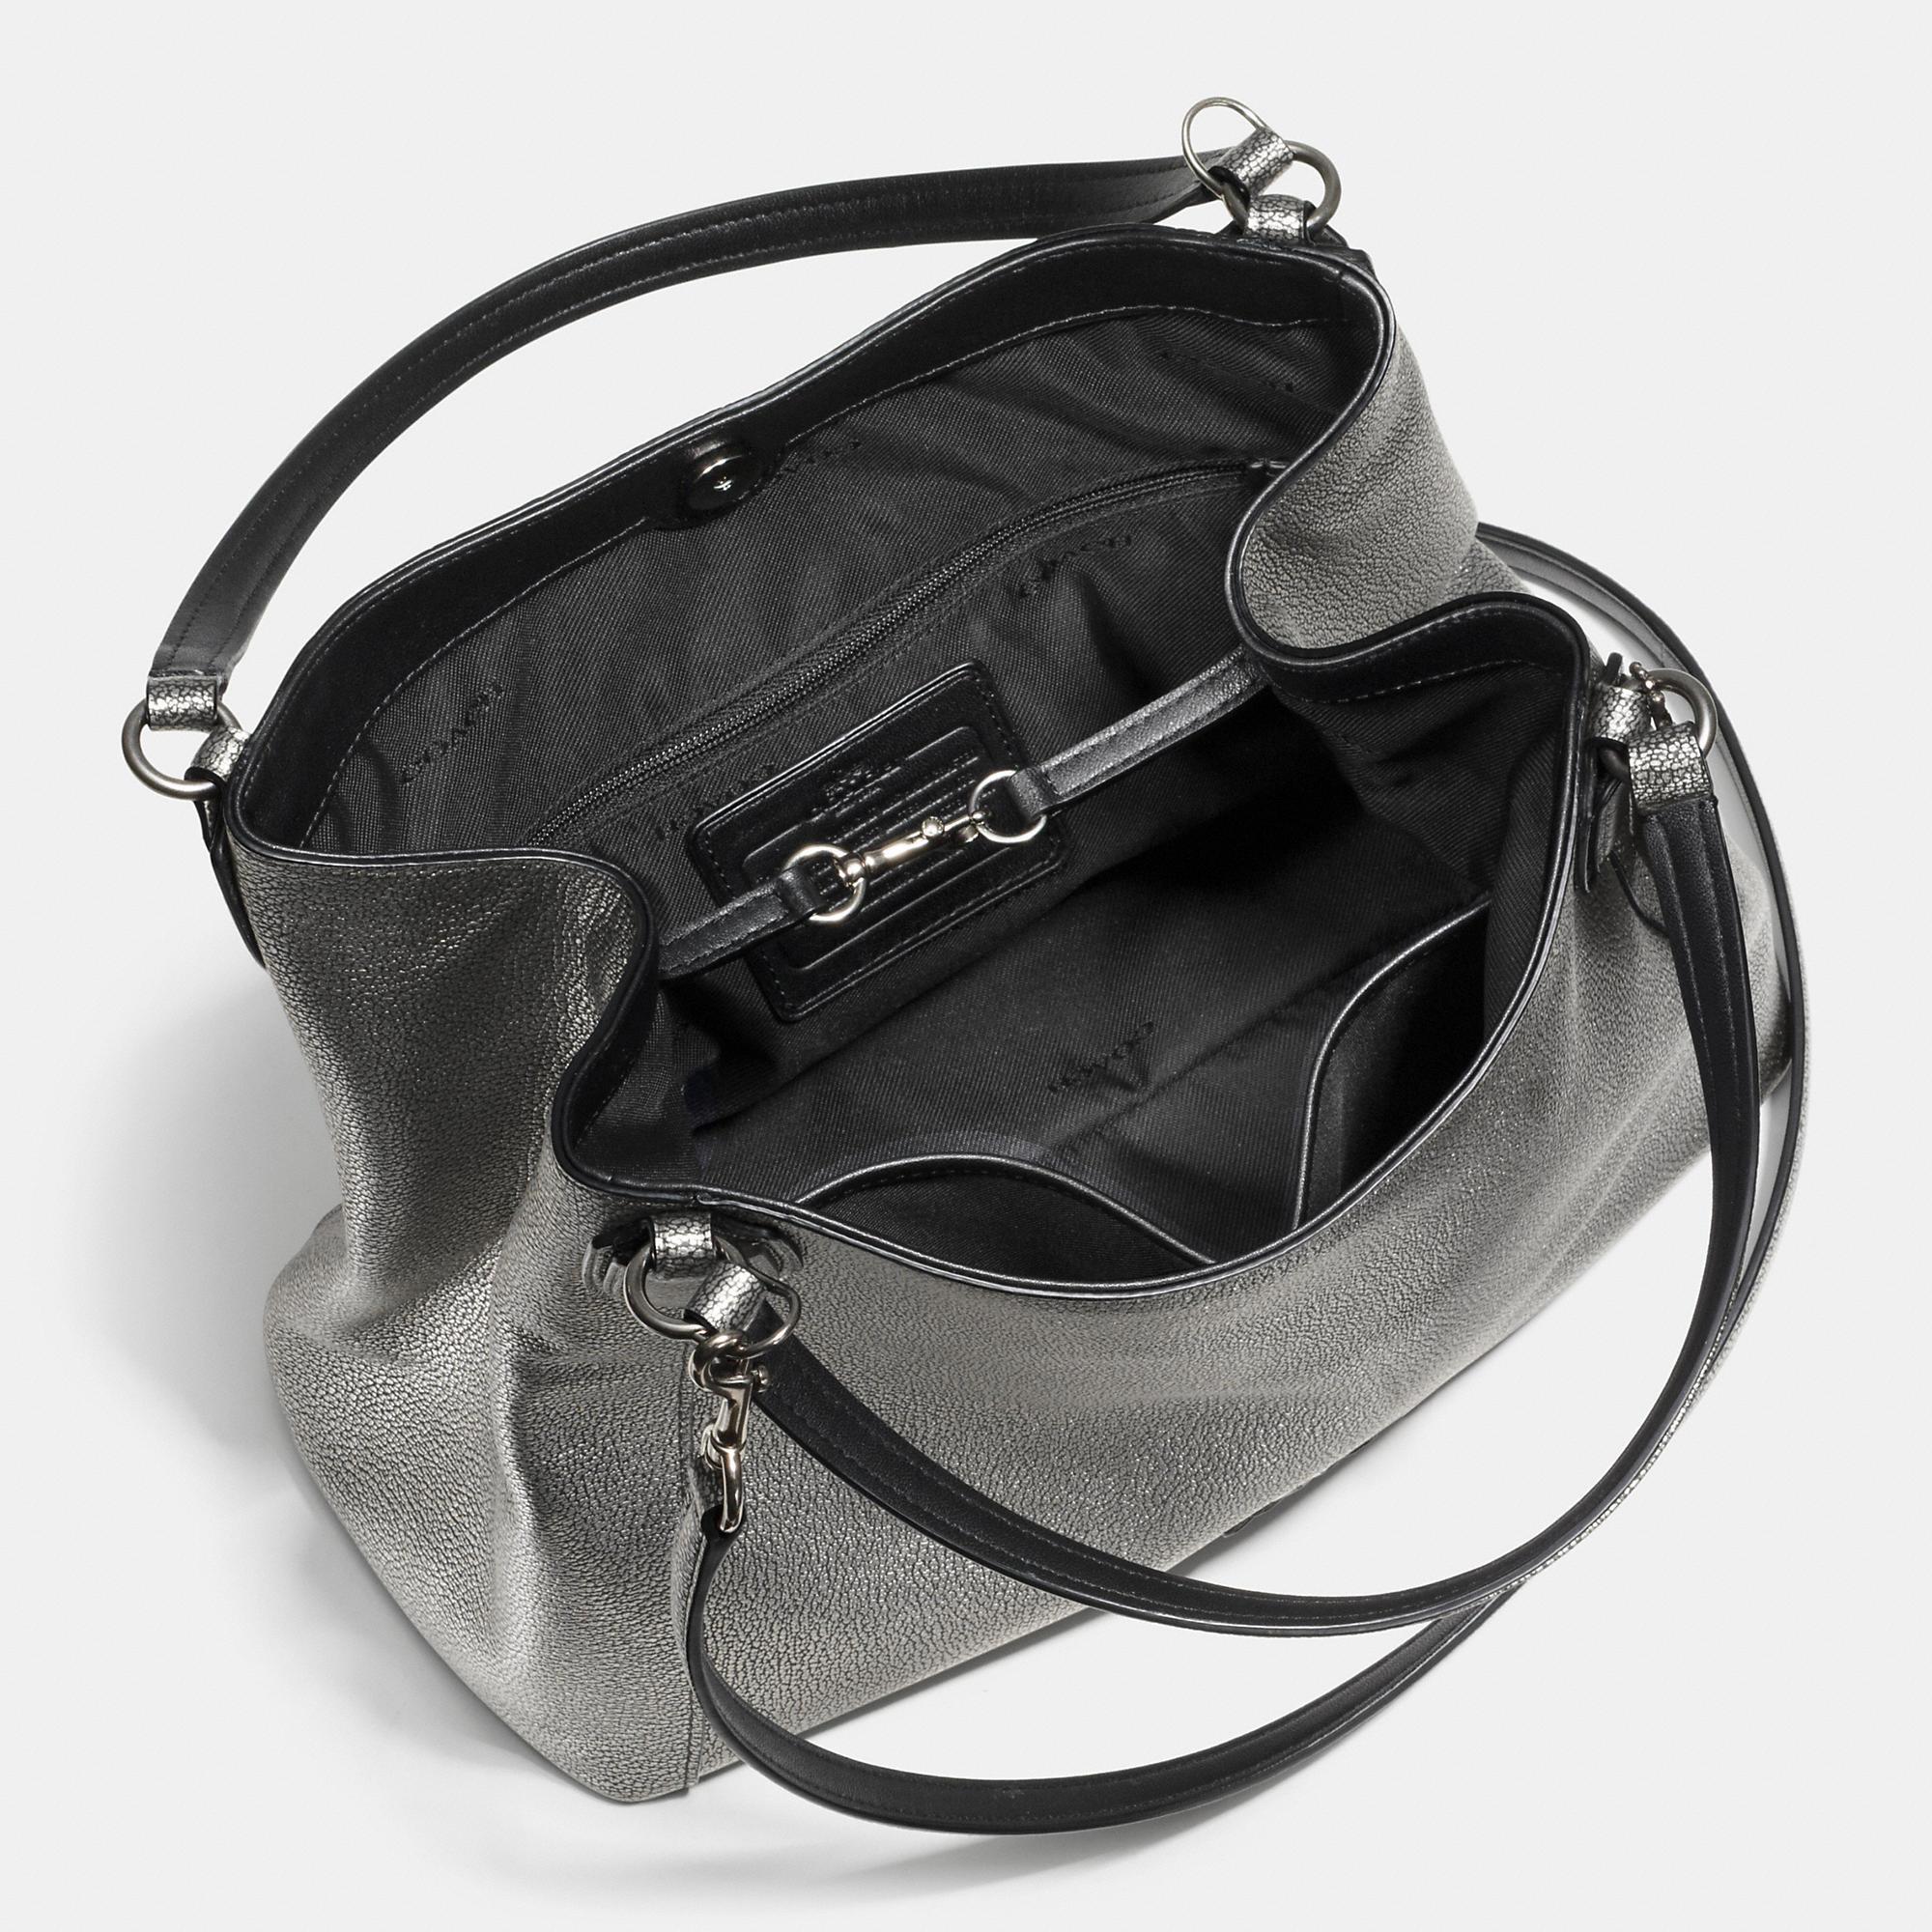 Bag Shoulder Metallic Pebble Lyst 28 Coach In Black Edie Leather wtqKtBEX